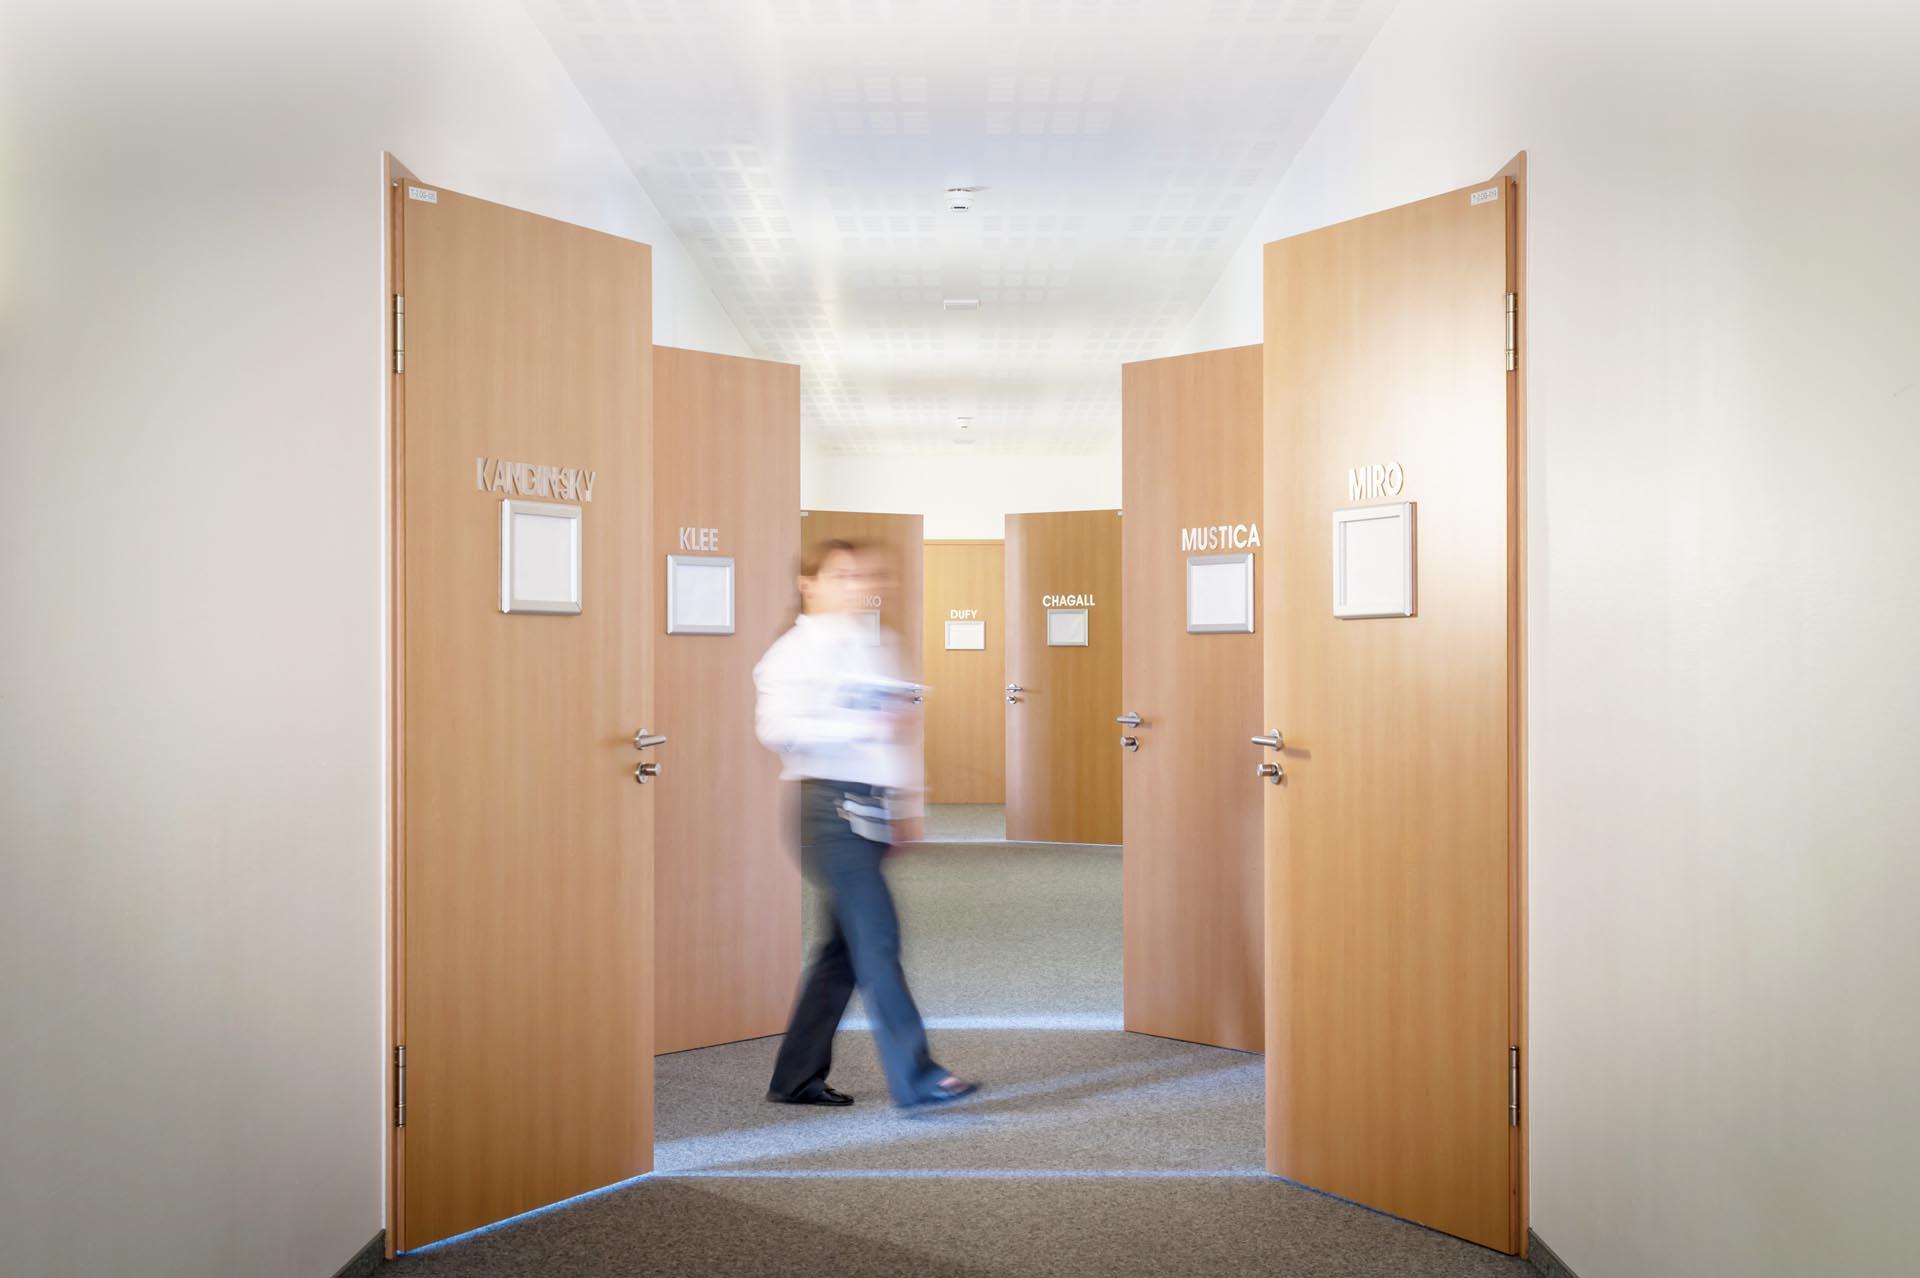 Corridor at Hotel Frankenland in Bad Kissingen, Germany